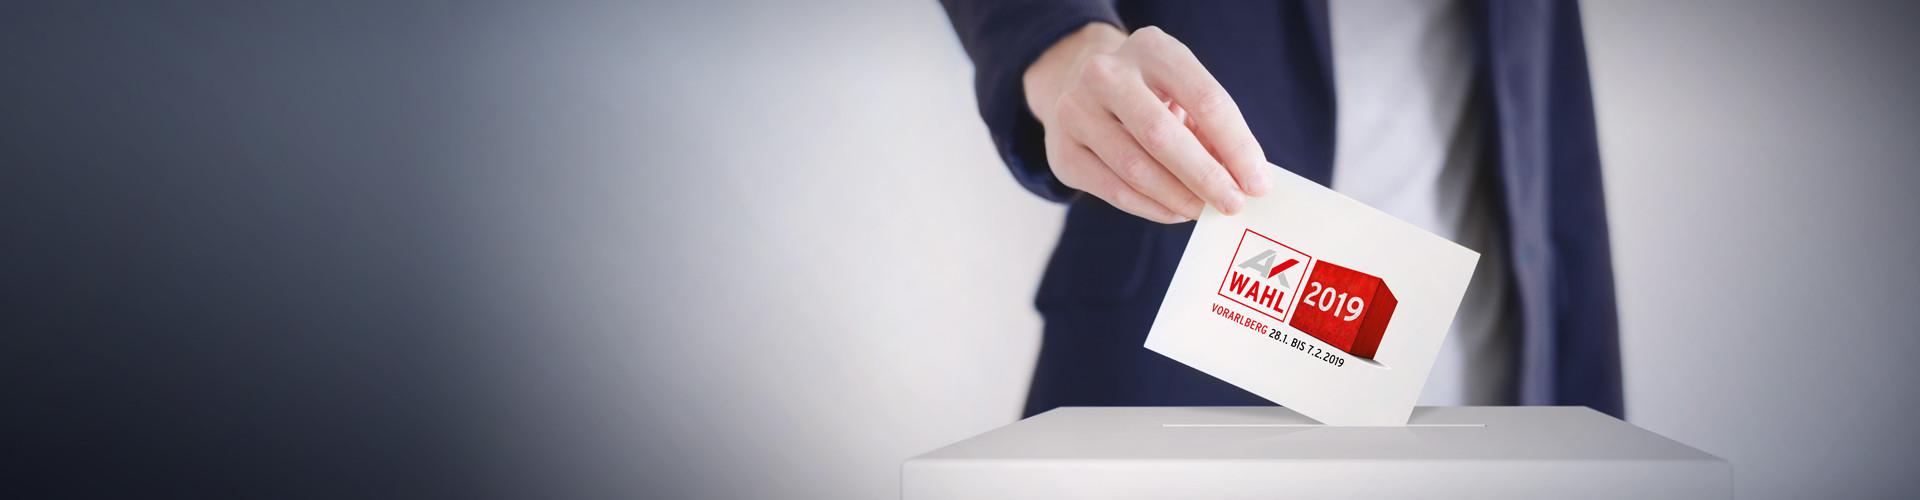 Karte wird in Wahlurne eingeworfen © Anton Sokolov, stock.adobe.com